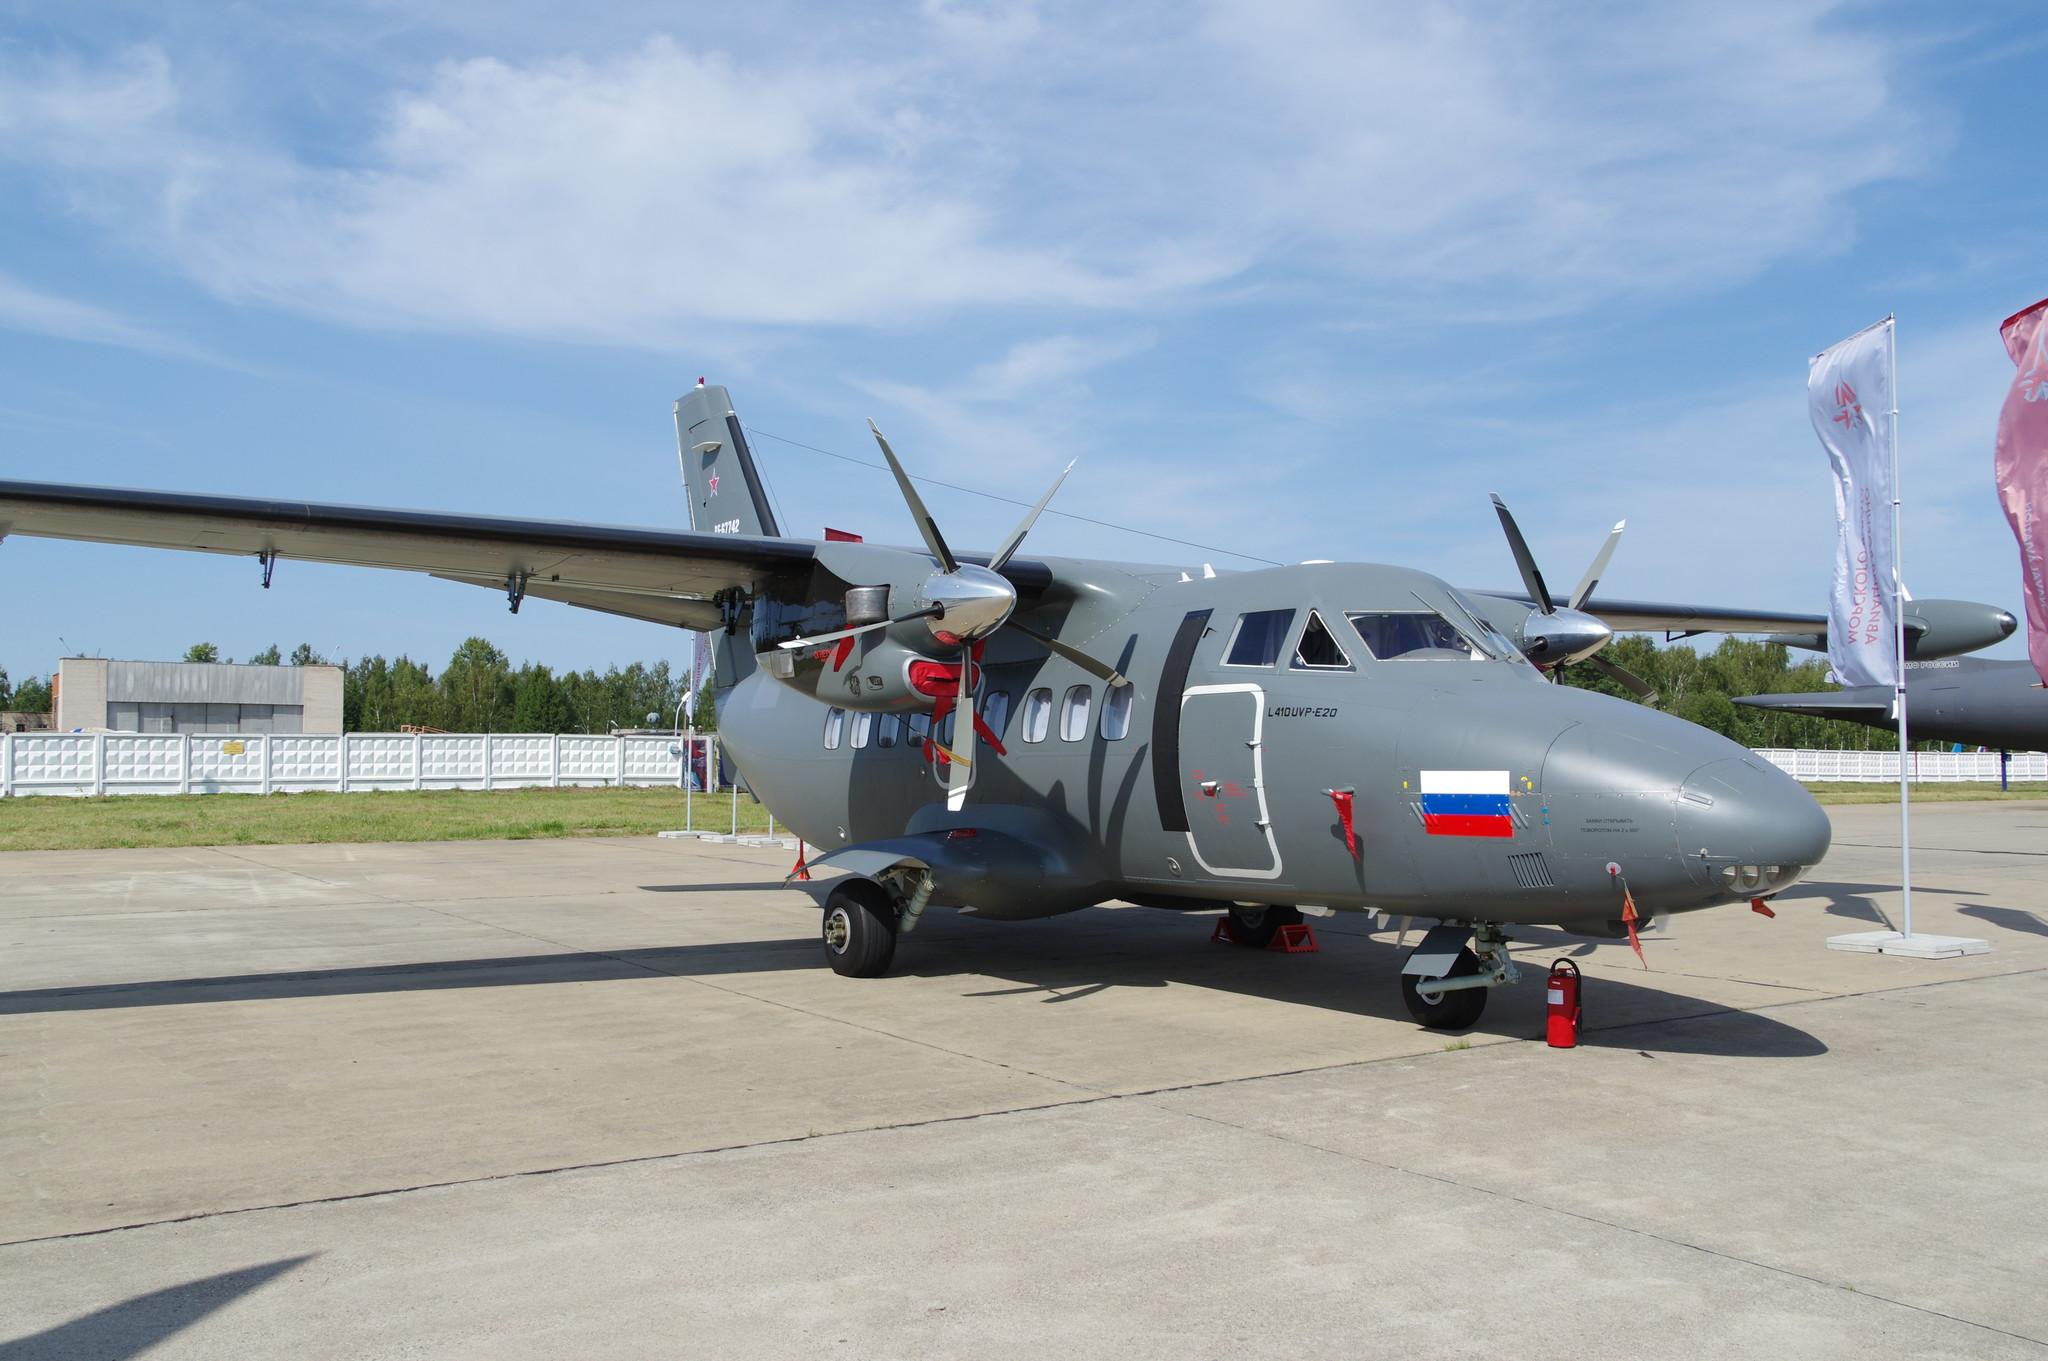 Самолёт L-410 UVP-E20